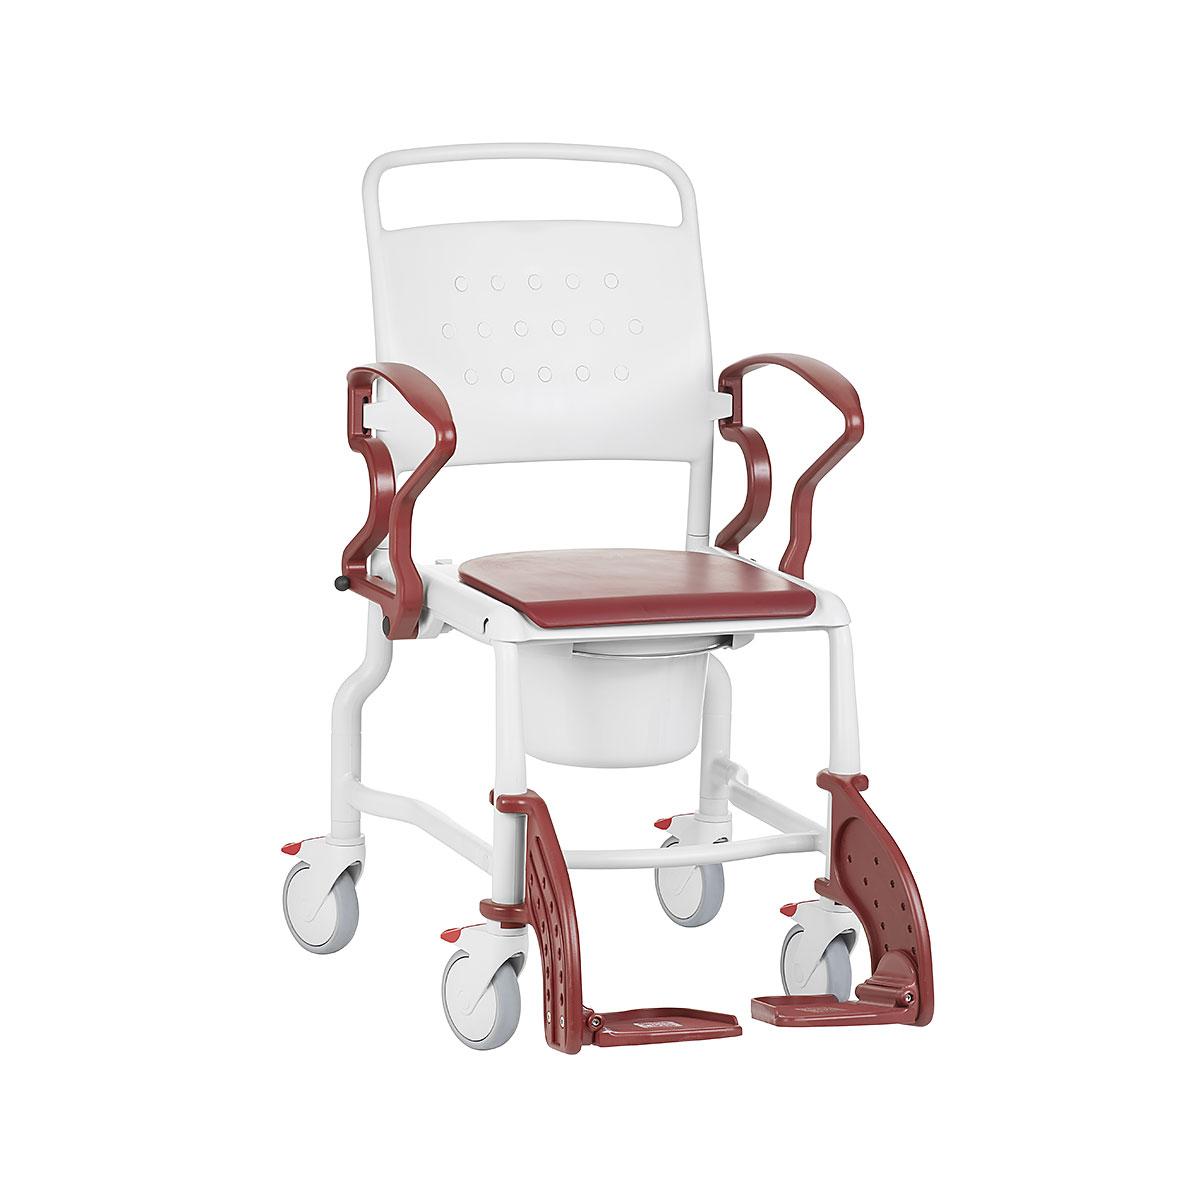 Rebotec Bonn - Shower Commode Chair